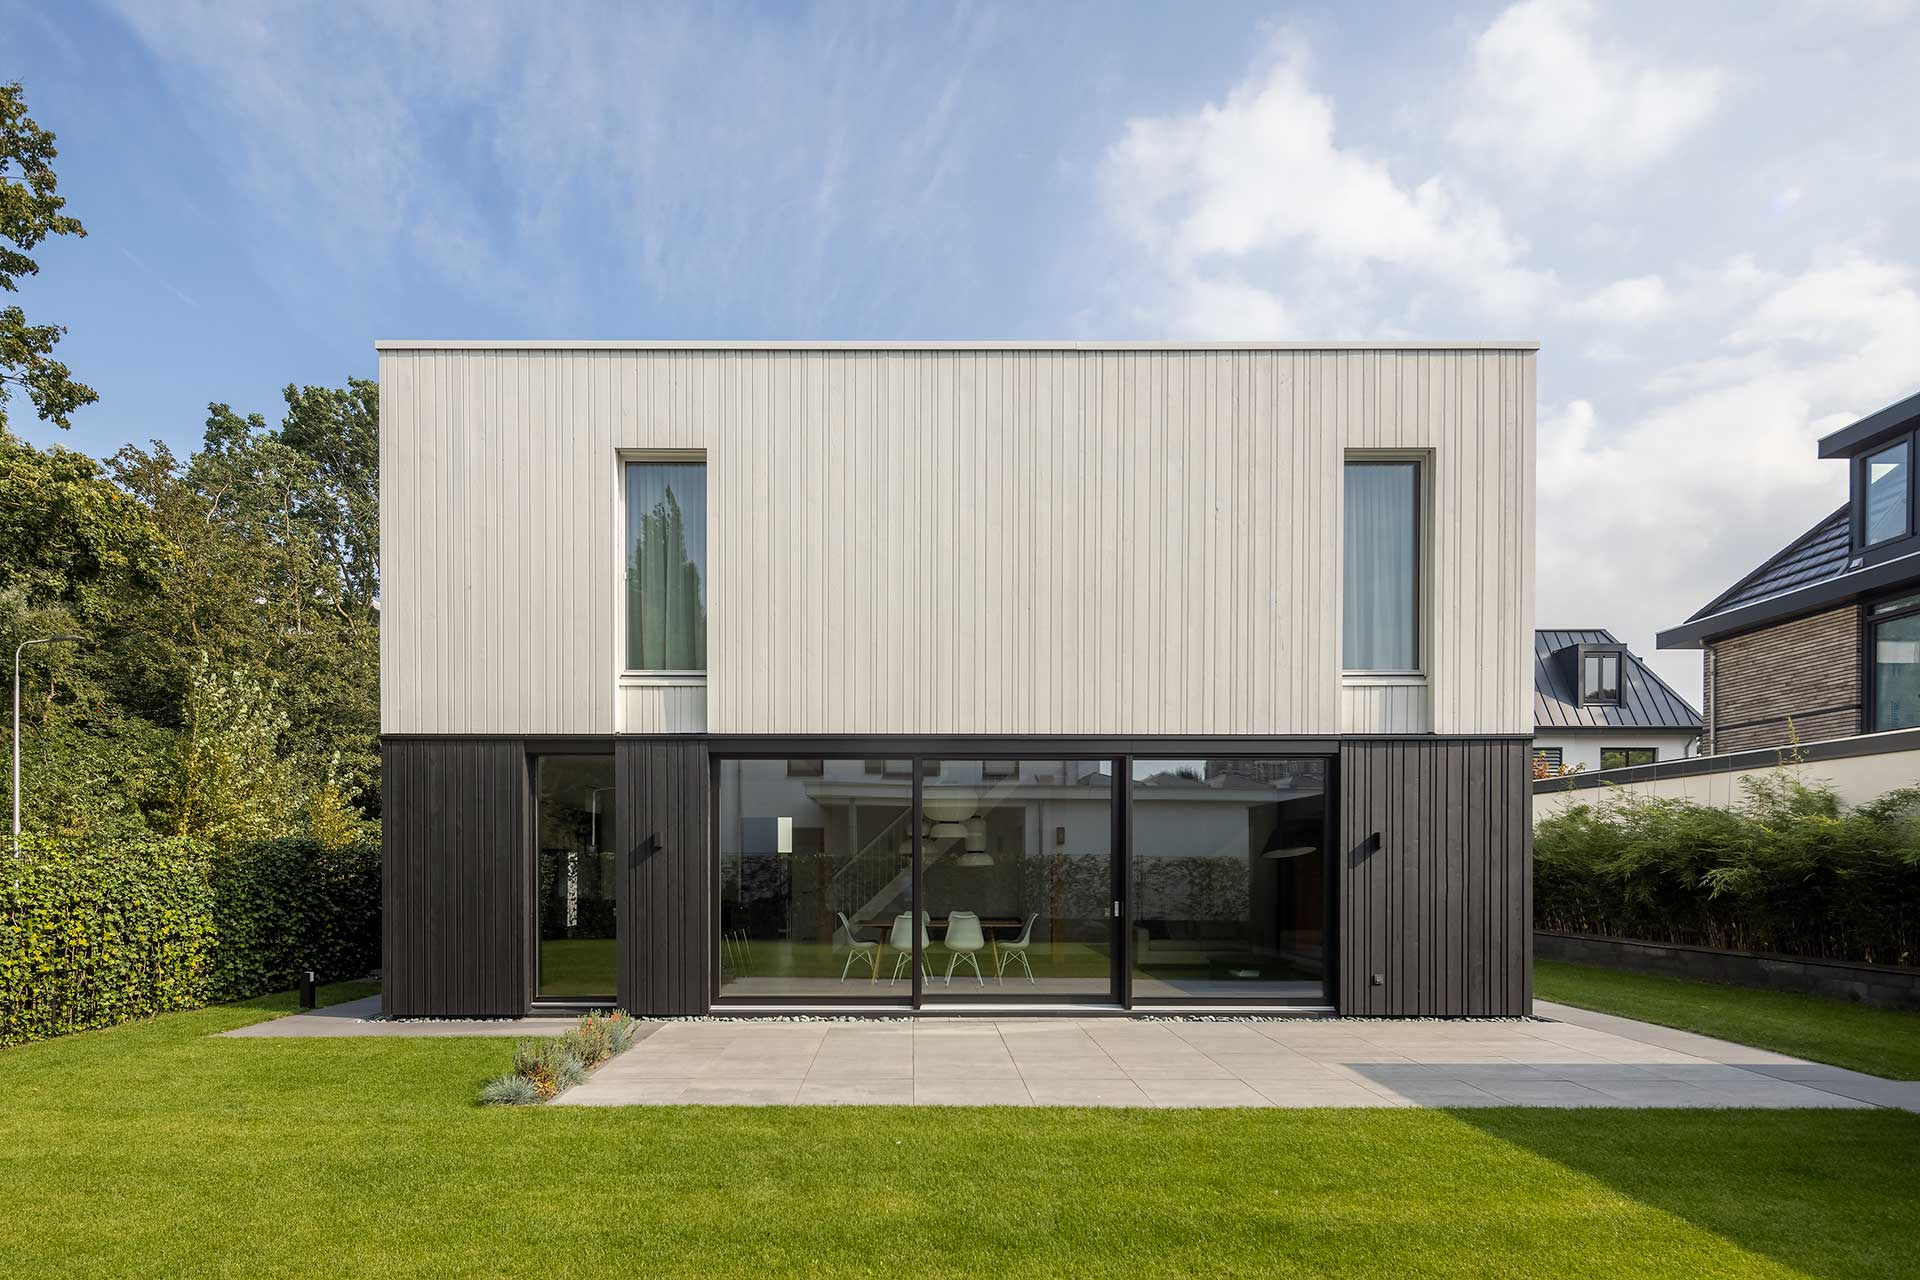 Architect moderne villa - Villa Middenwaard, Amstelveen